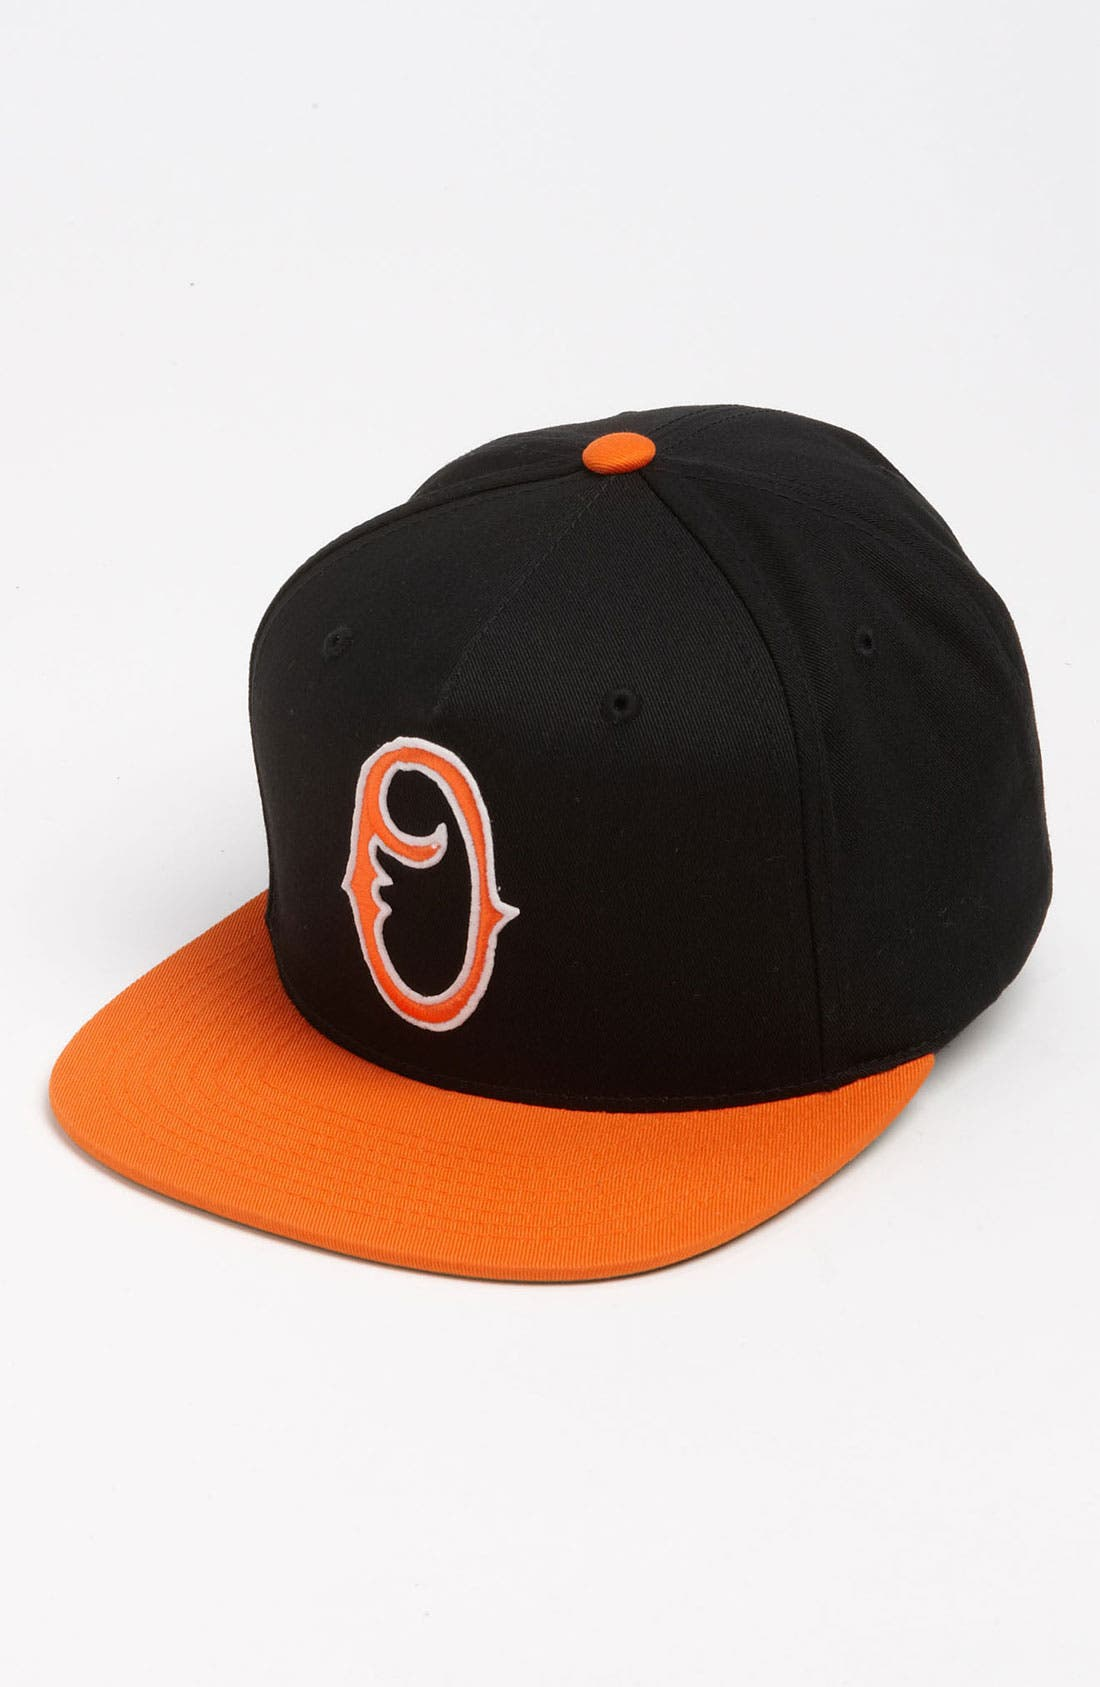 Main Image - Obey 'Staple' Snapback Baseball Cap